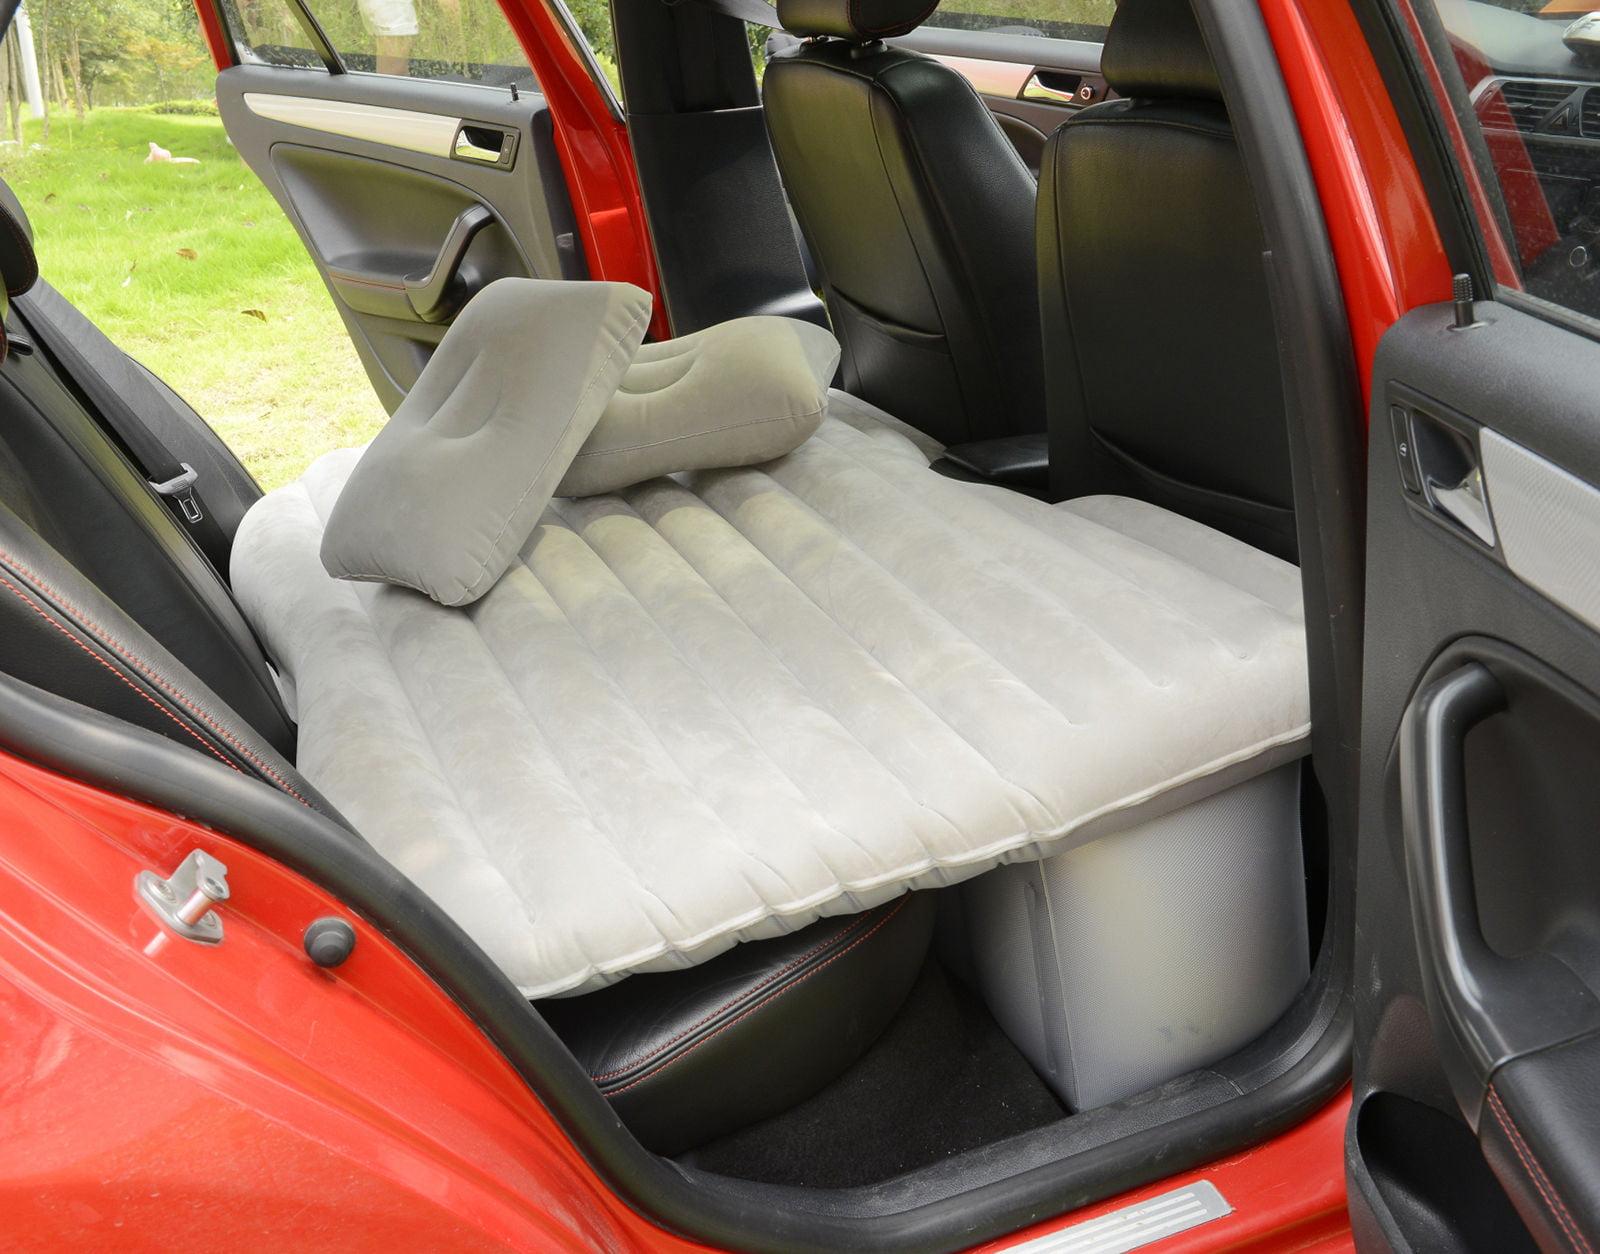 Heavy Duty Air Mattress >> Heavy Duty Car Suv Travel Inflatable Air Mattress Back Seat Camping